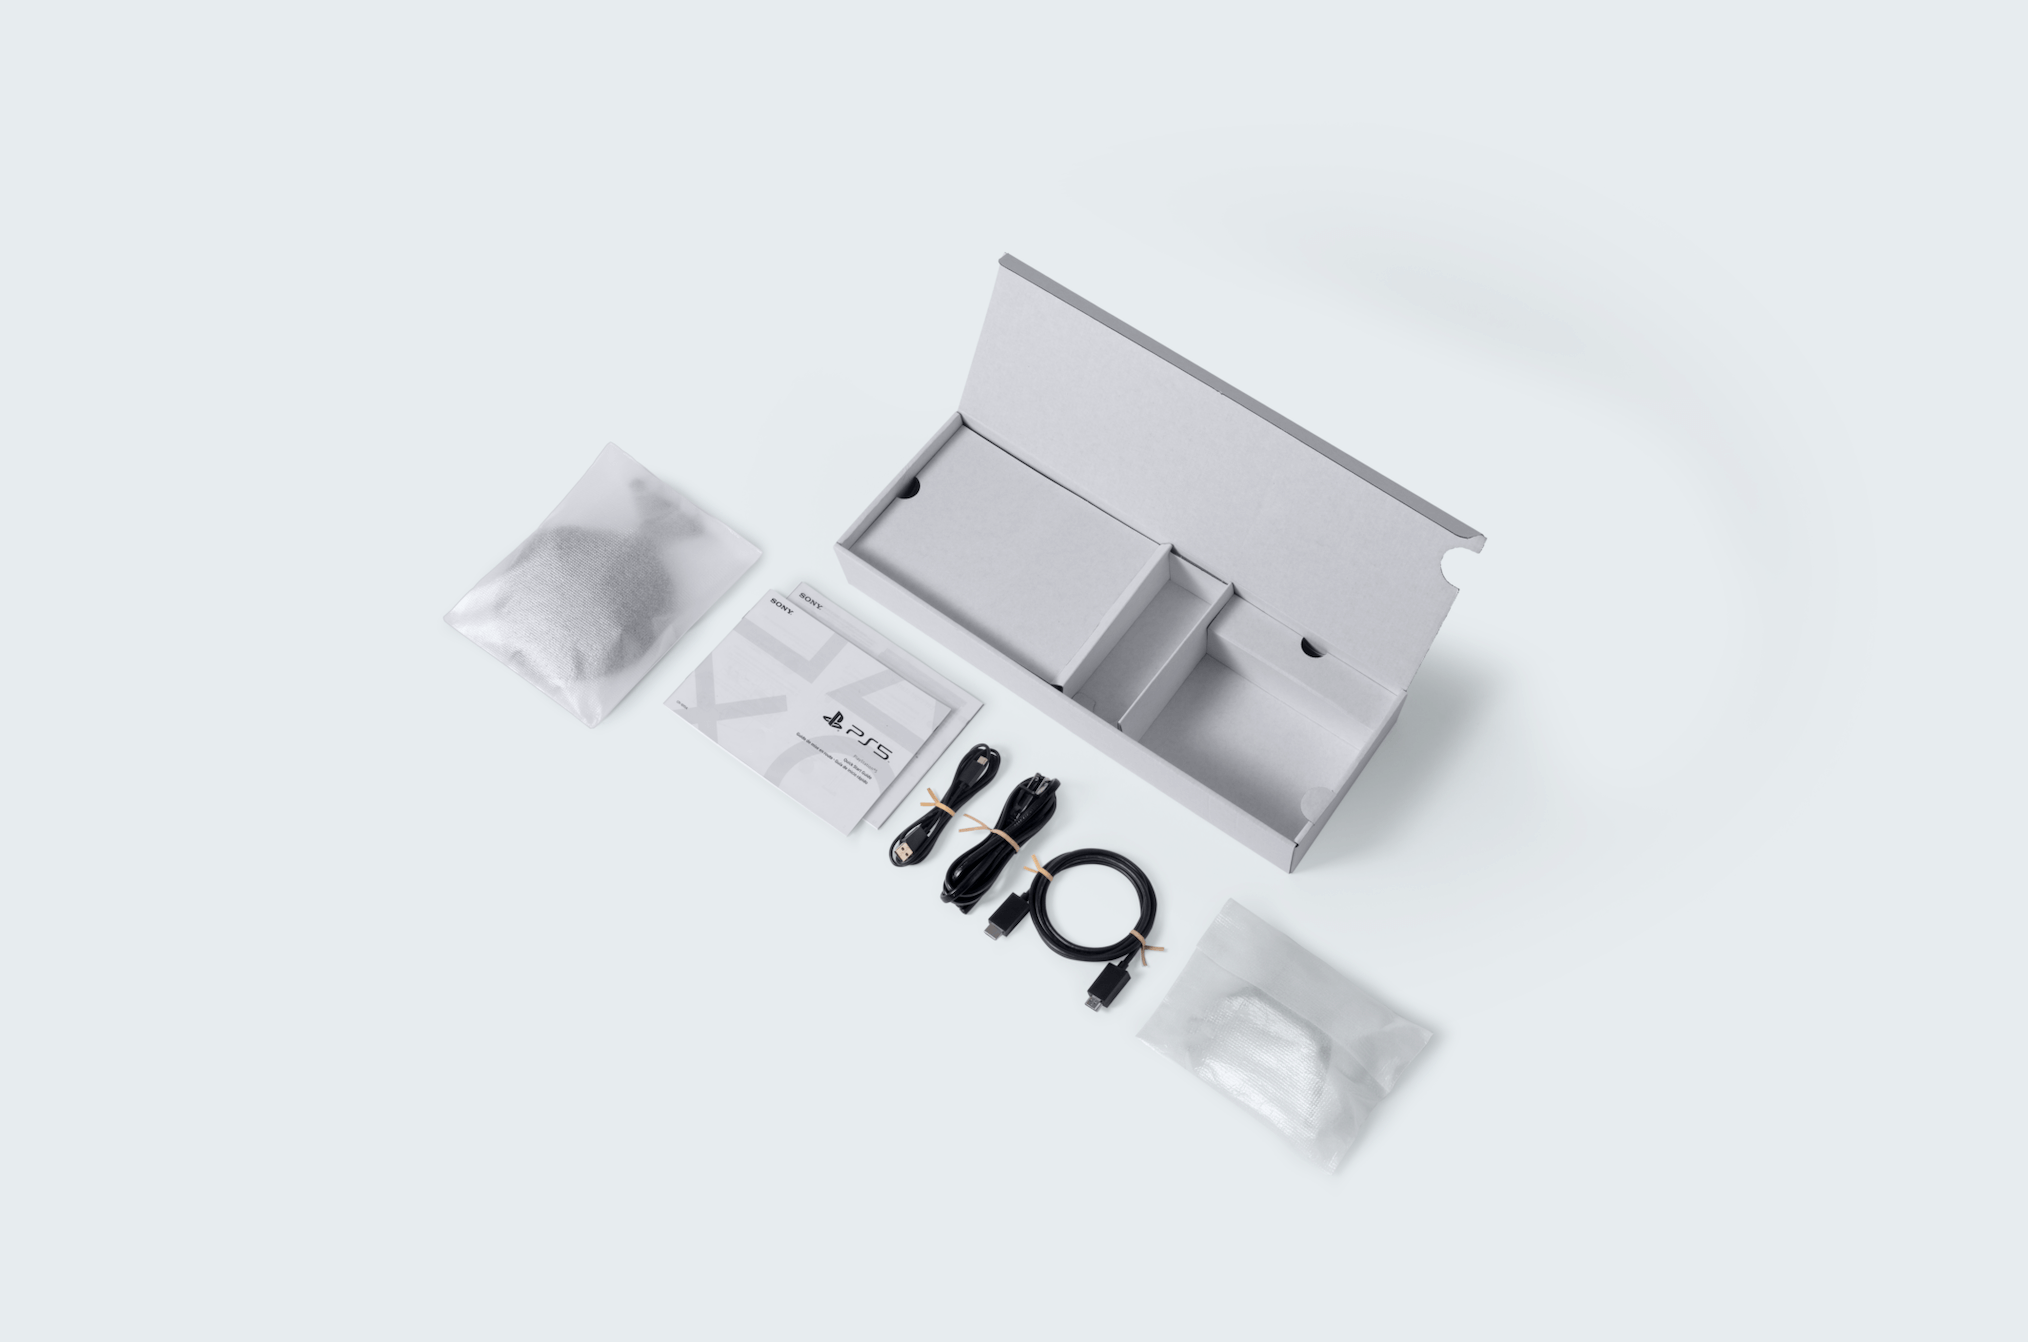 playstation 5 packaging